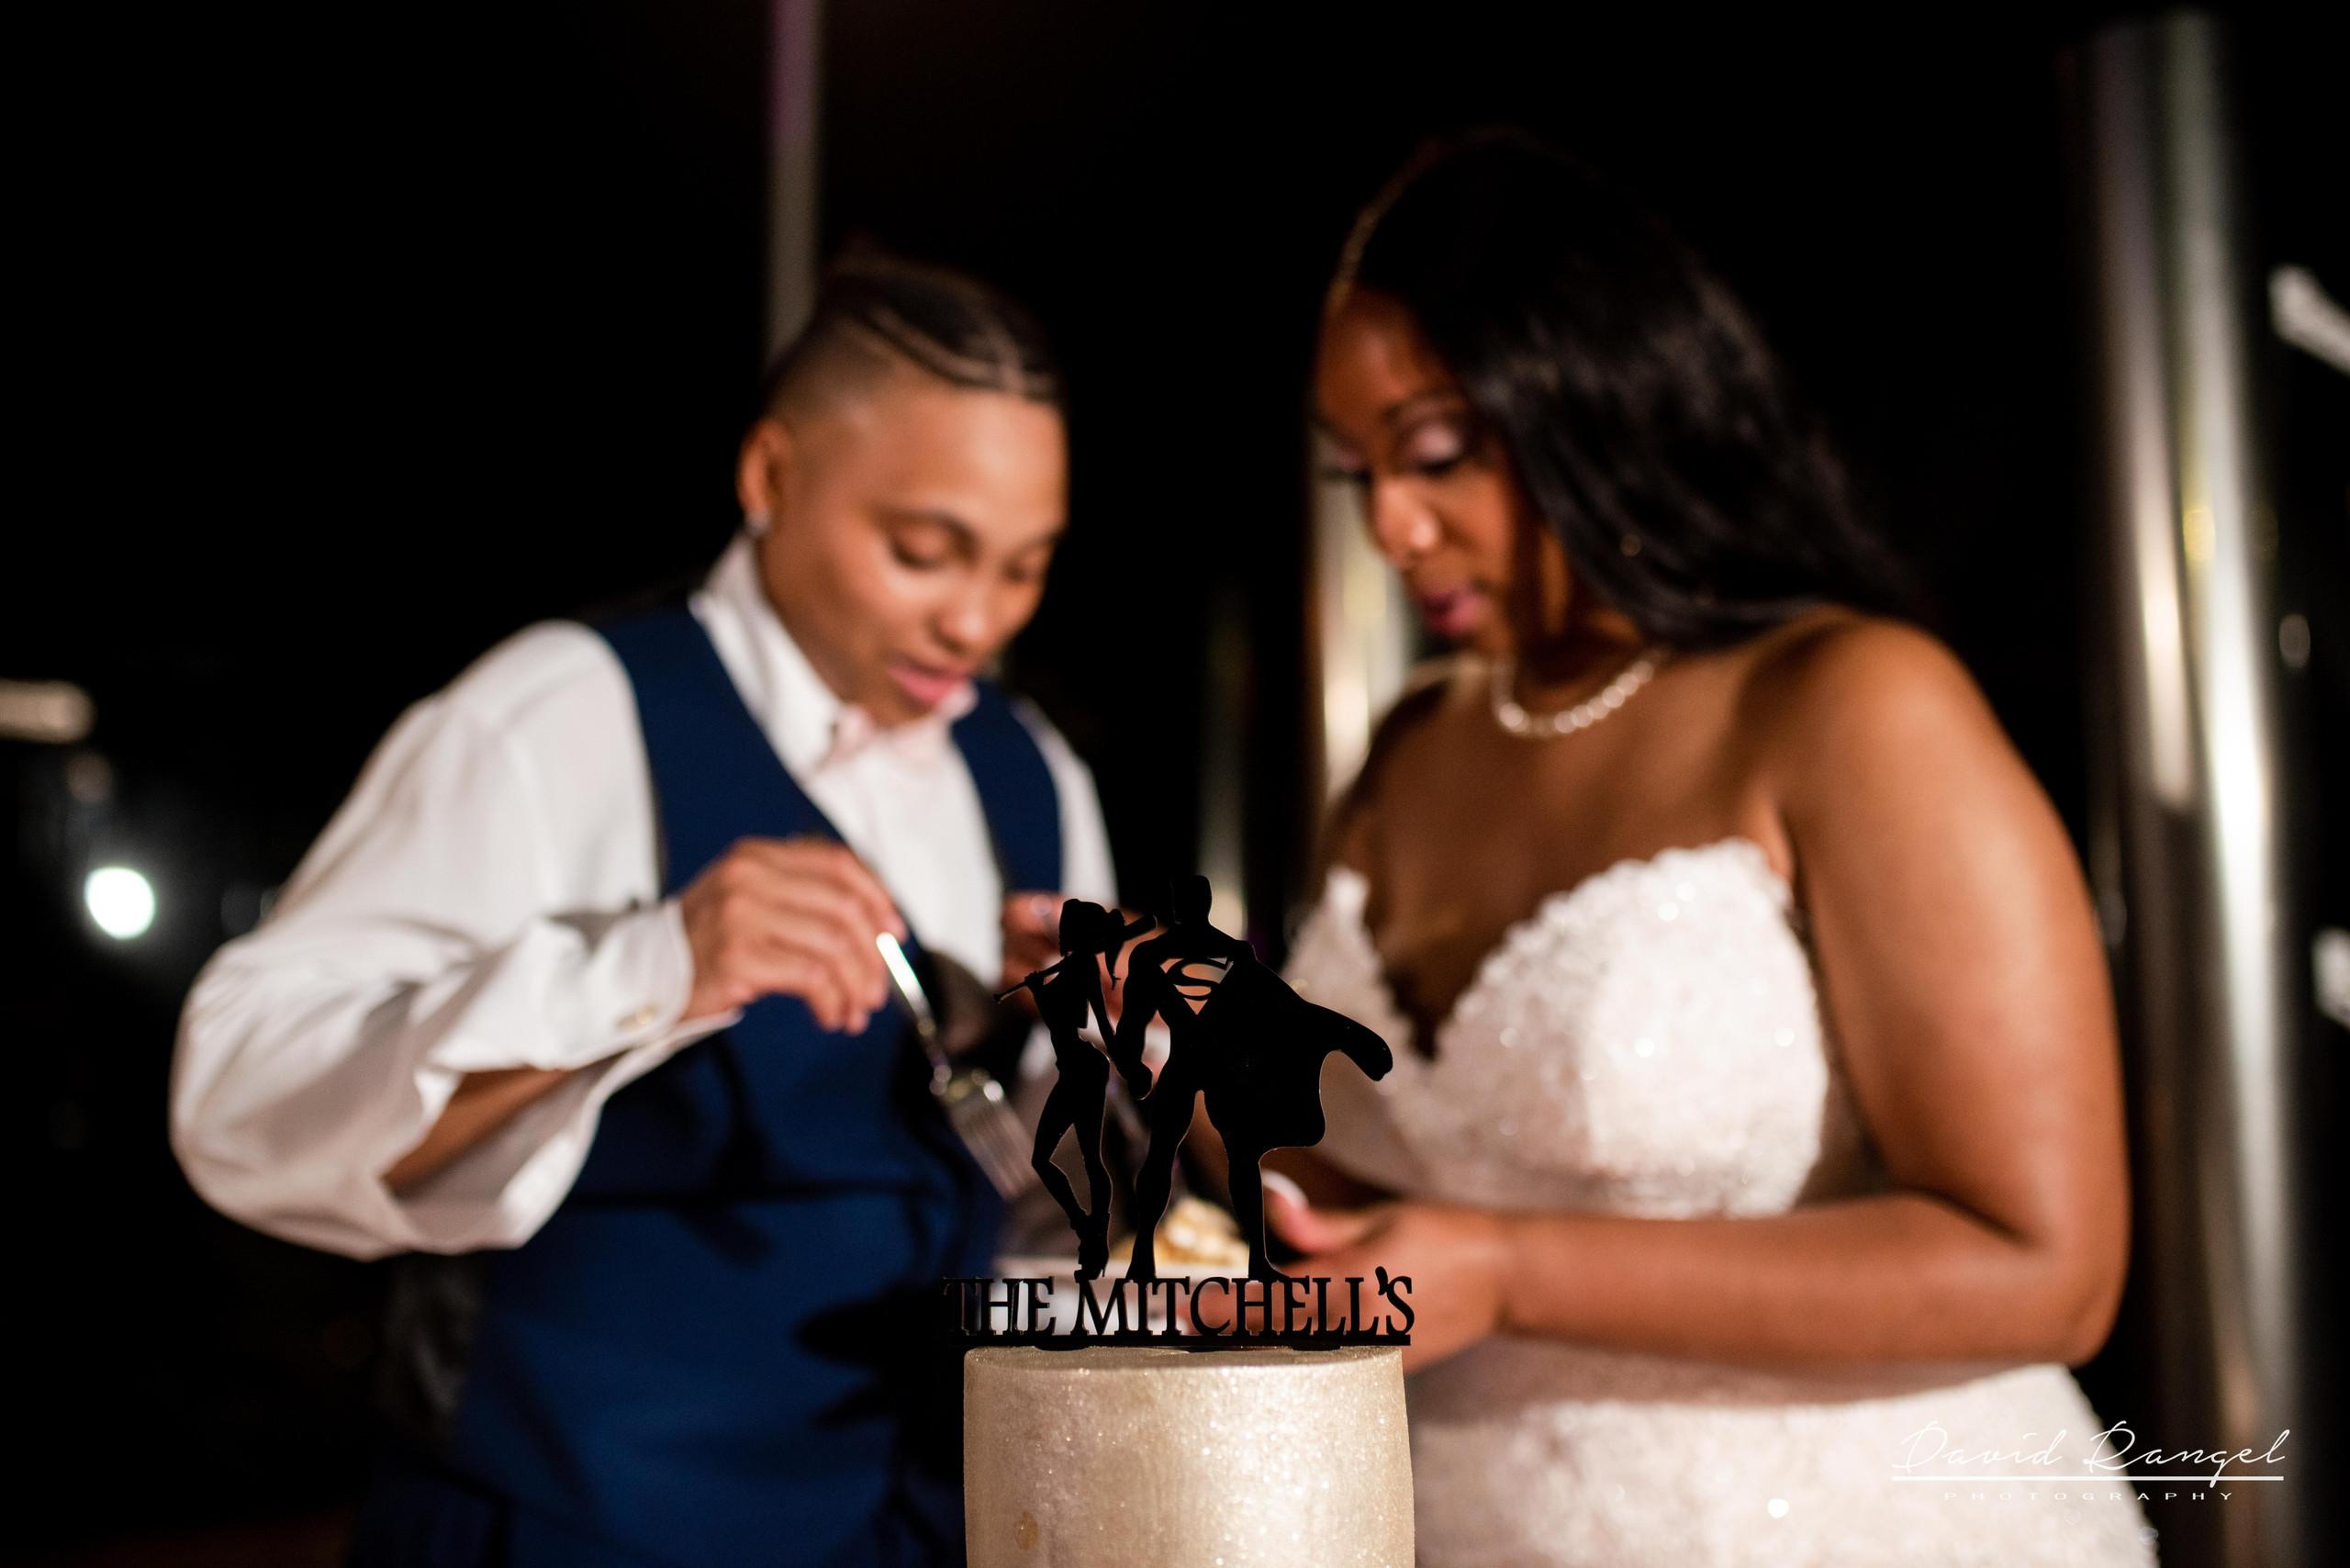 cake+cutting+brides+gay+marriage